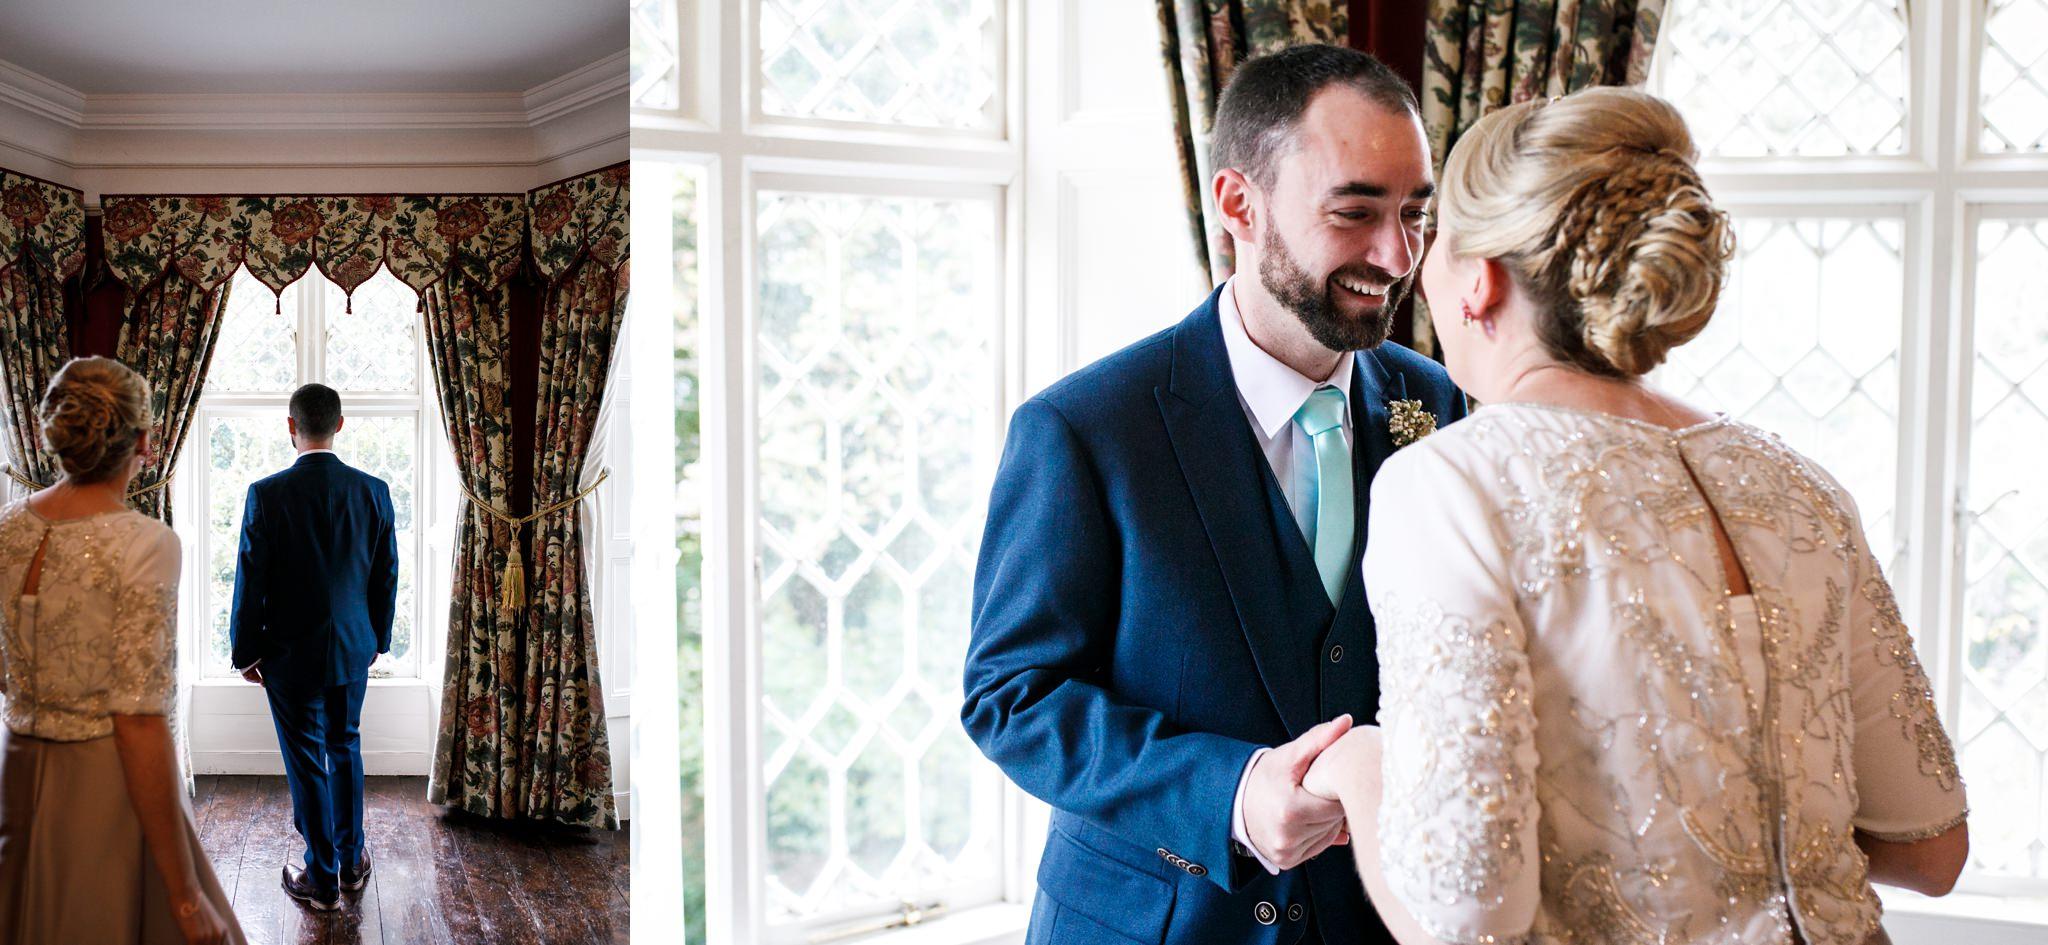 Elisha-Clarke-Photography-Dublin-City-Wedding_0058.jpg